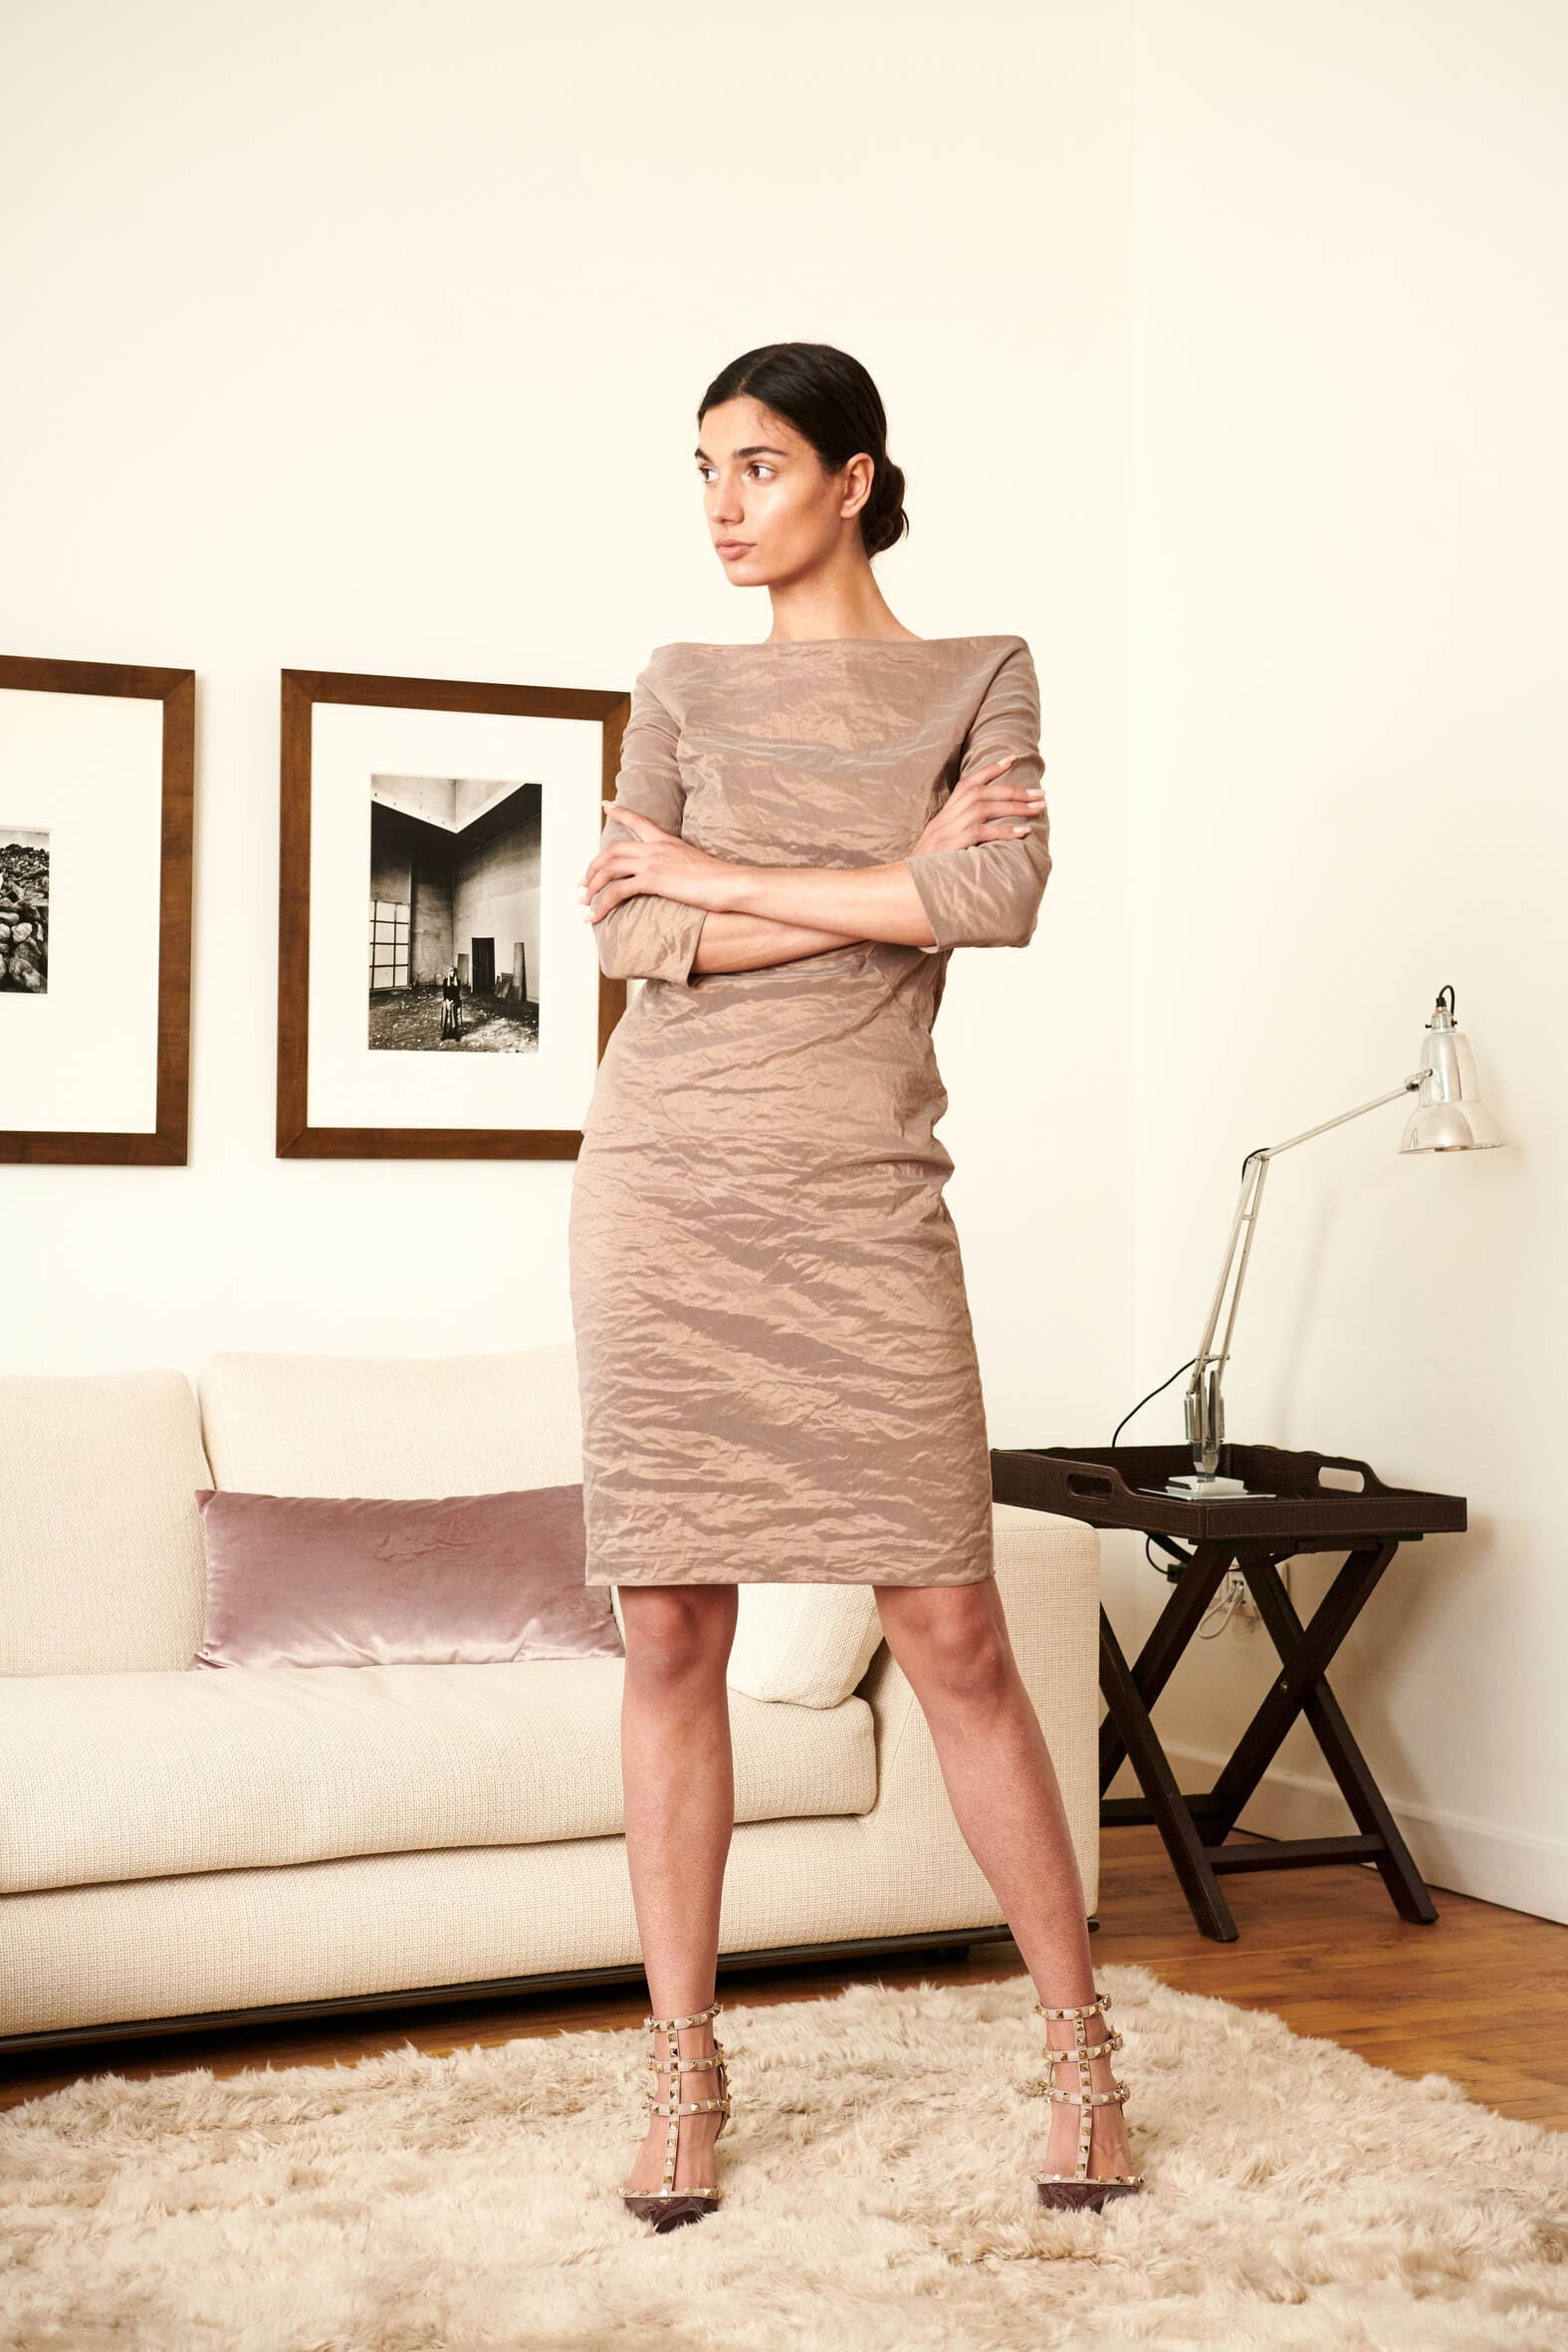 Unser Bestseller Cocktailkleid Crash Couture. Material: Seide / Baumwolle / Elasthan / Metallfaden Farbe: Taupe